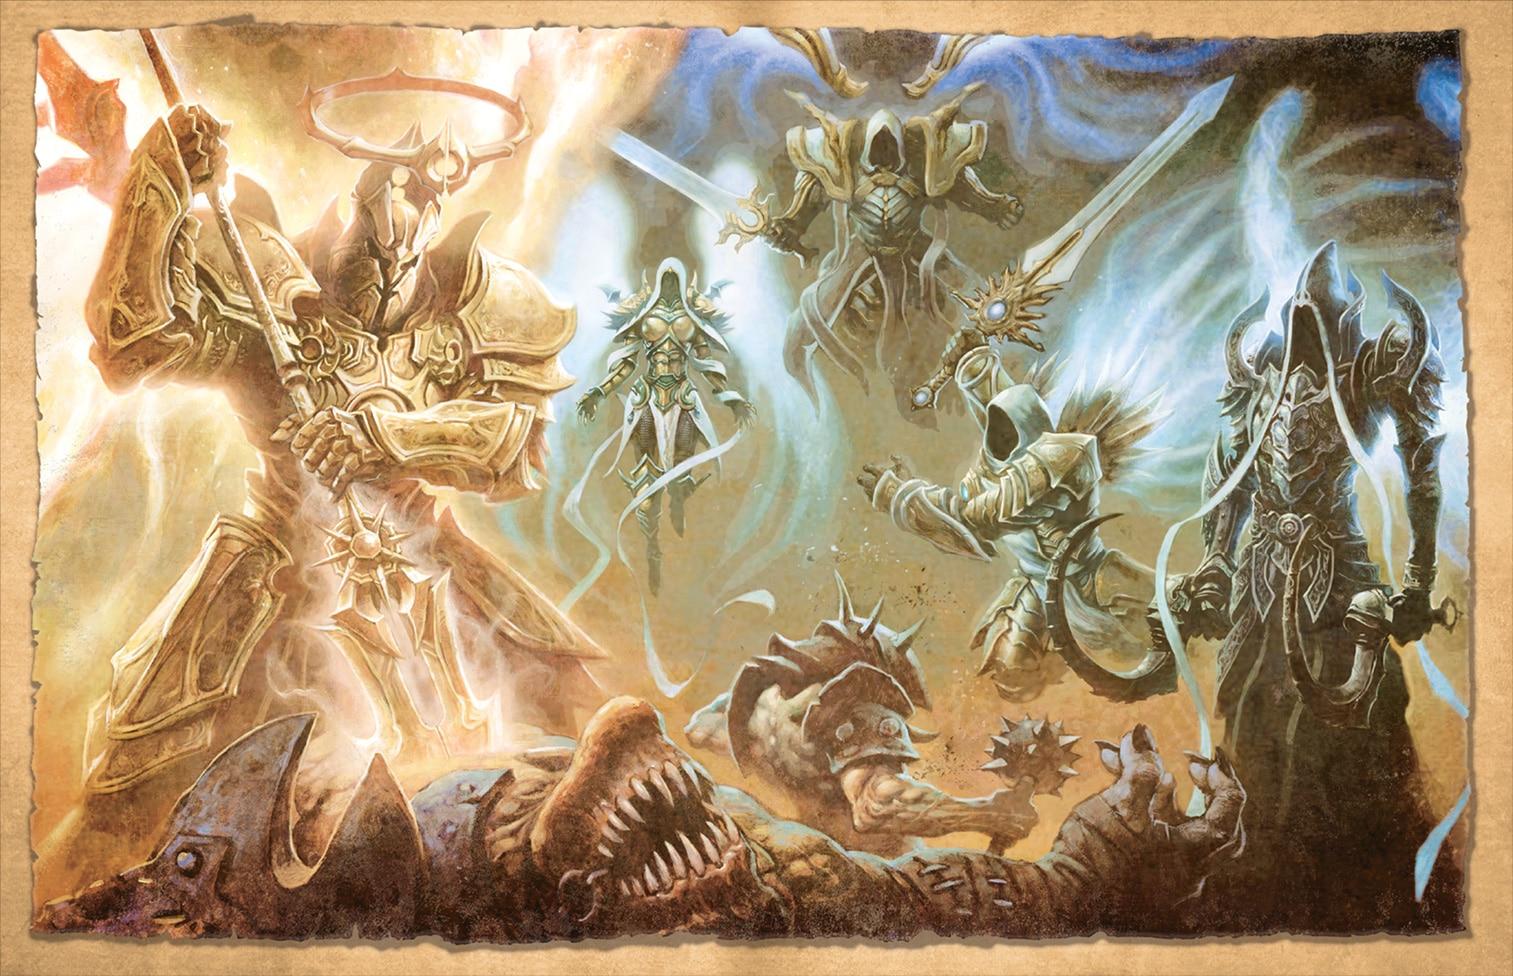 Book of Adria: A Diablo Beastiary Now Available - Diablo III